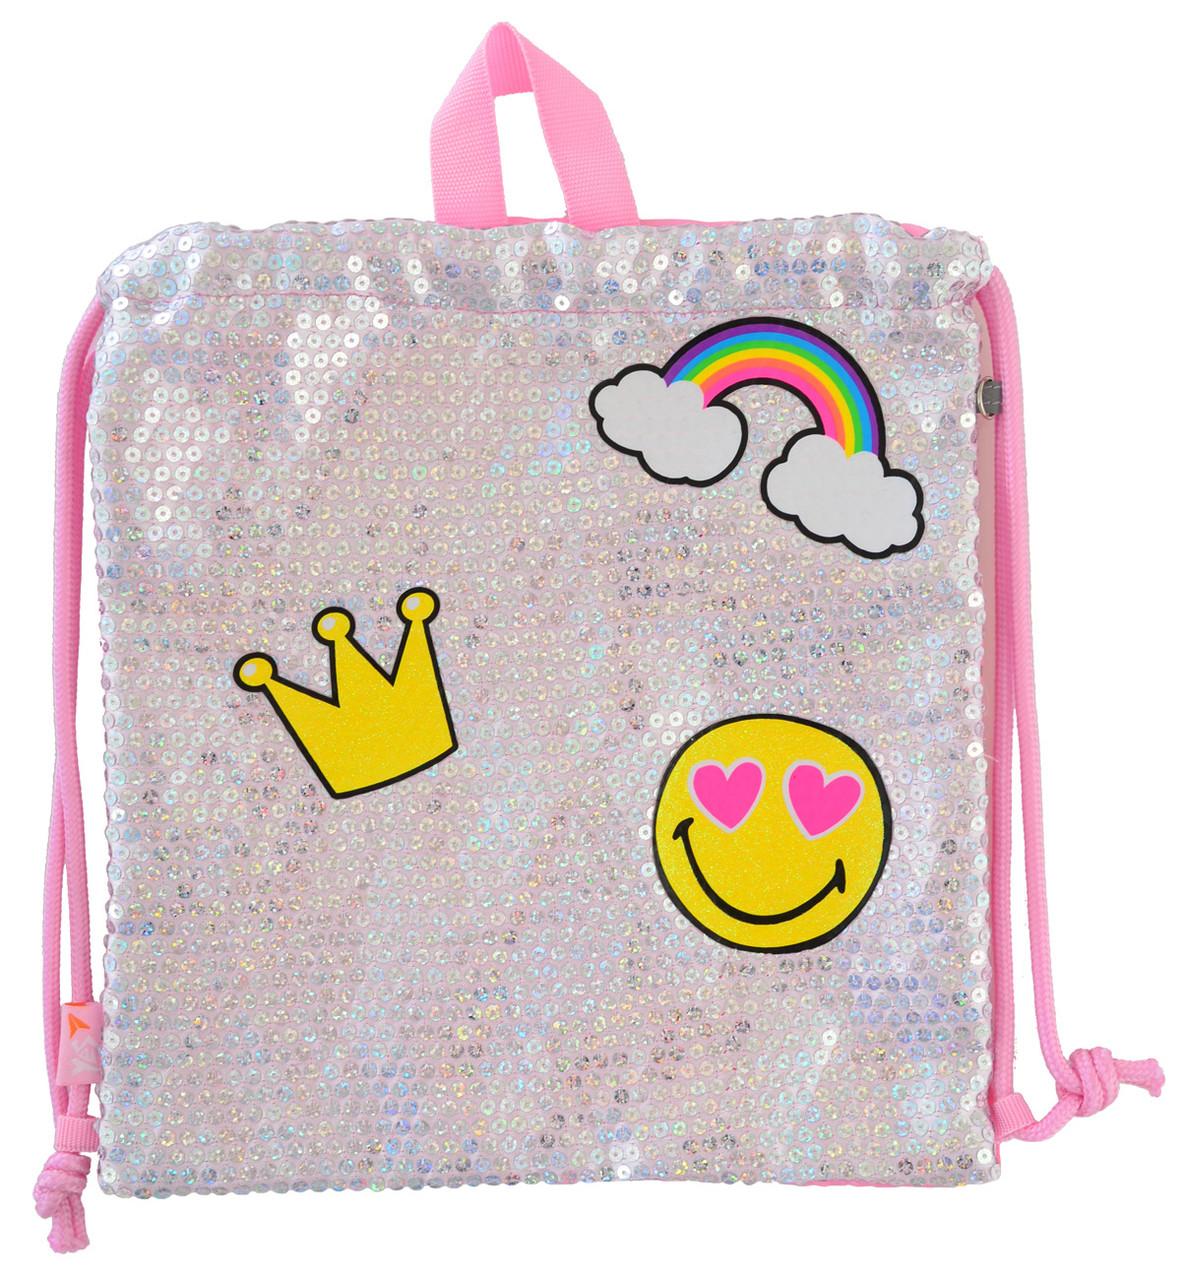 Сумка-мешок YES детская SB-14 Funny код: 556797